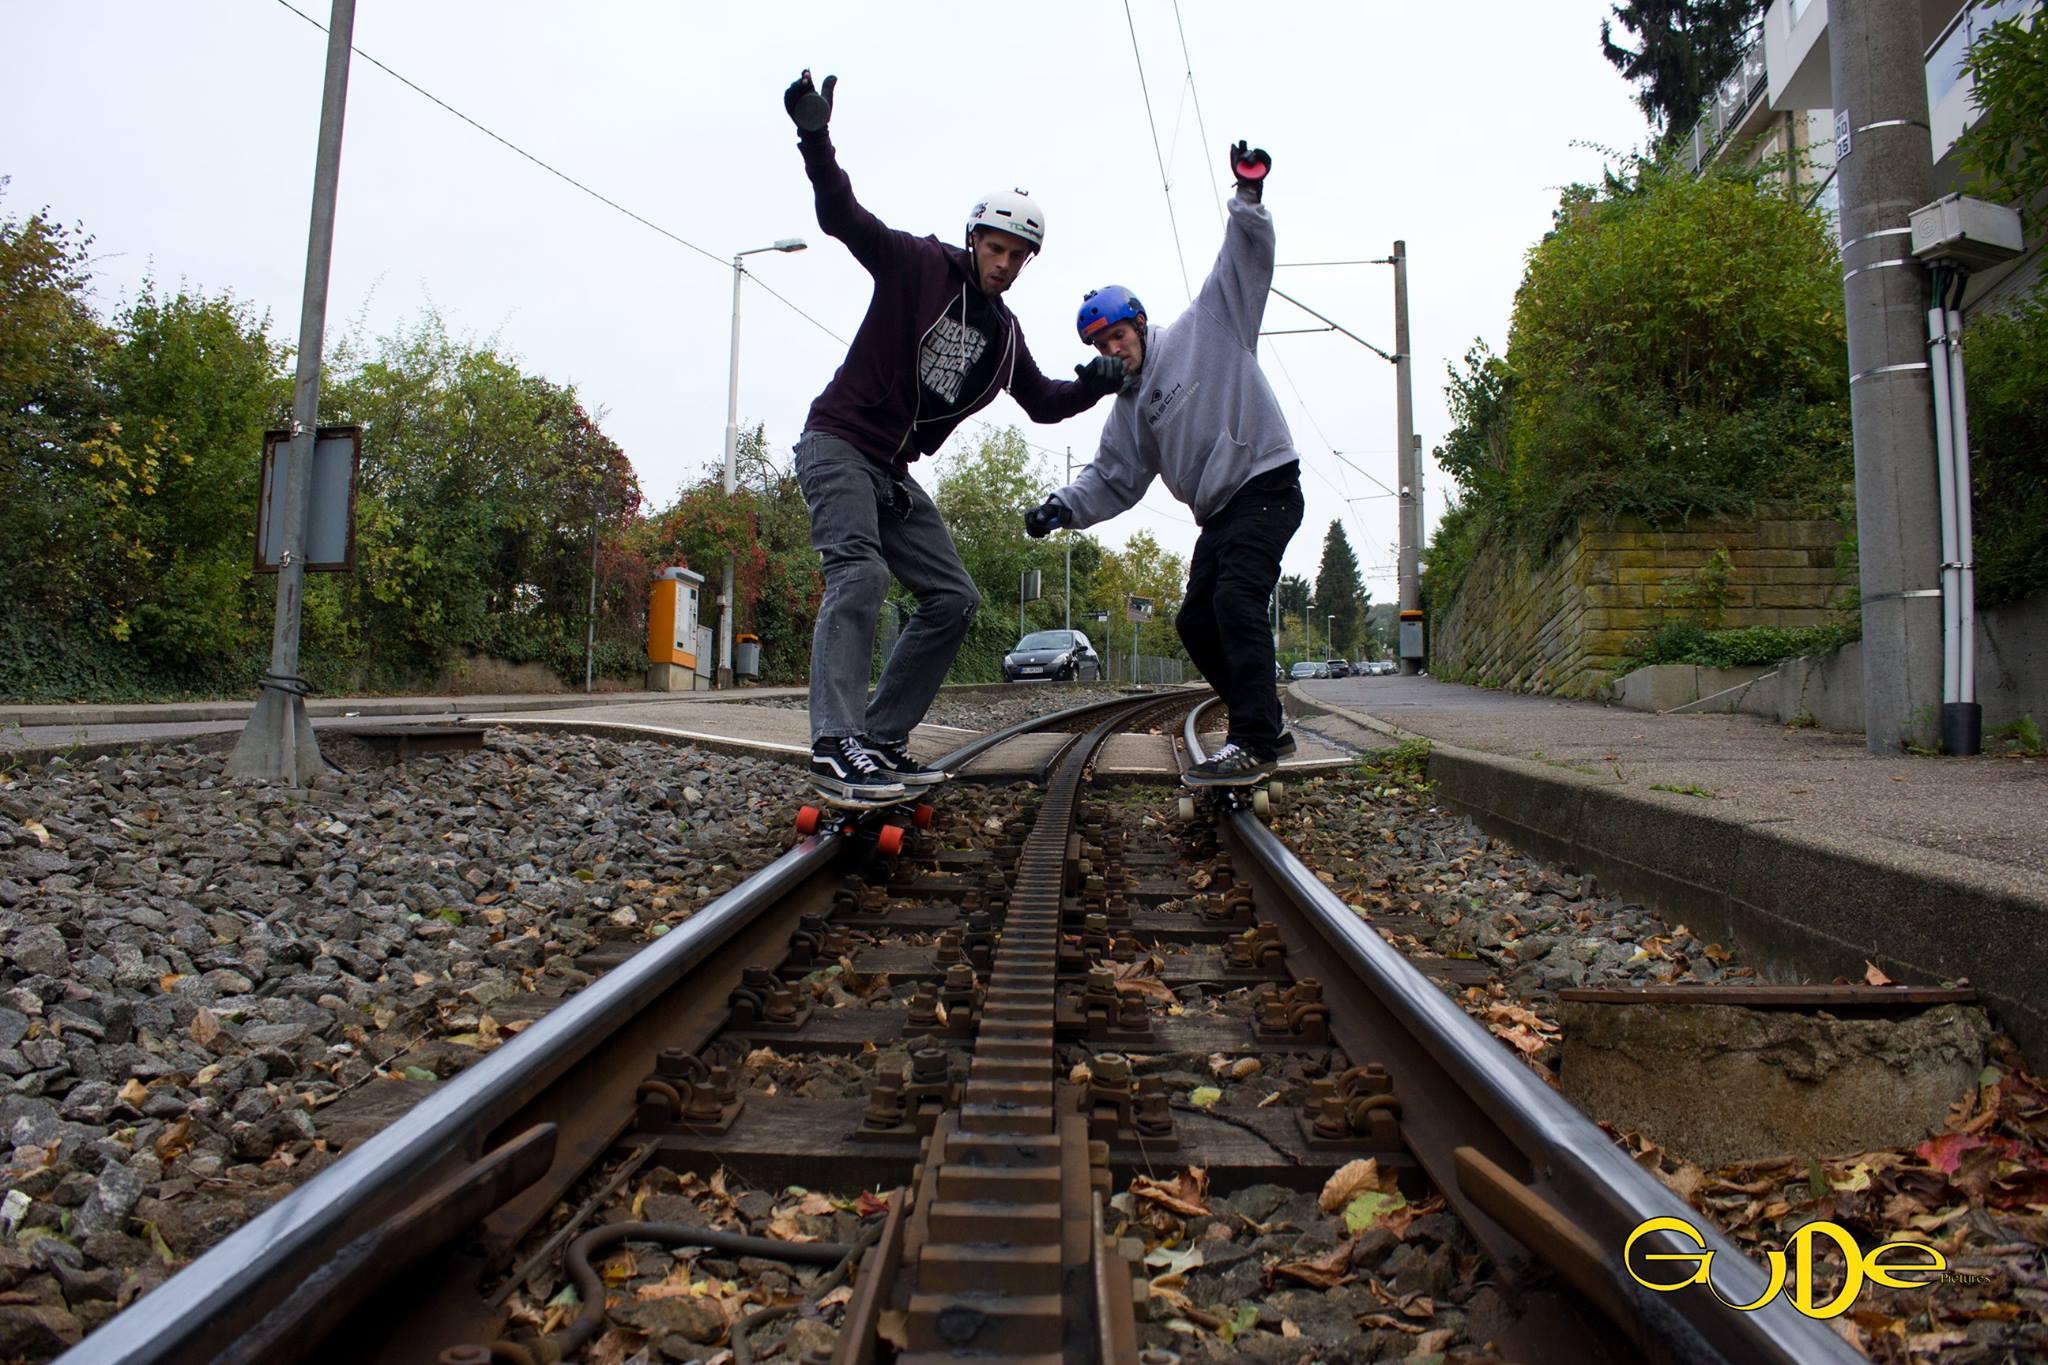 like riding rails